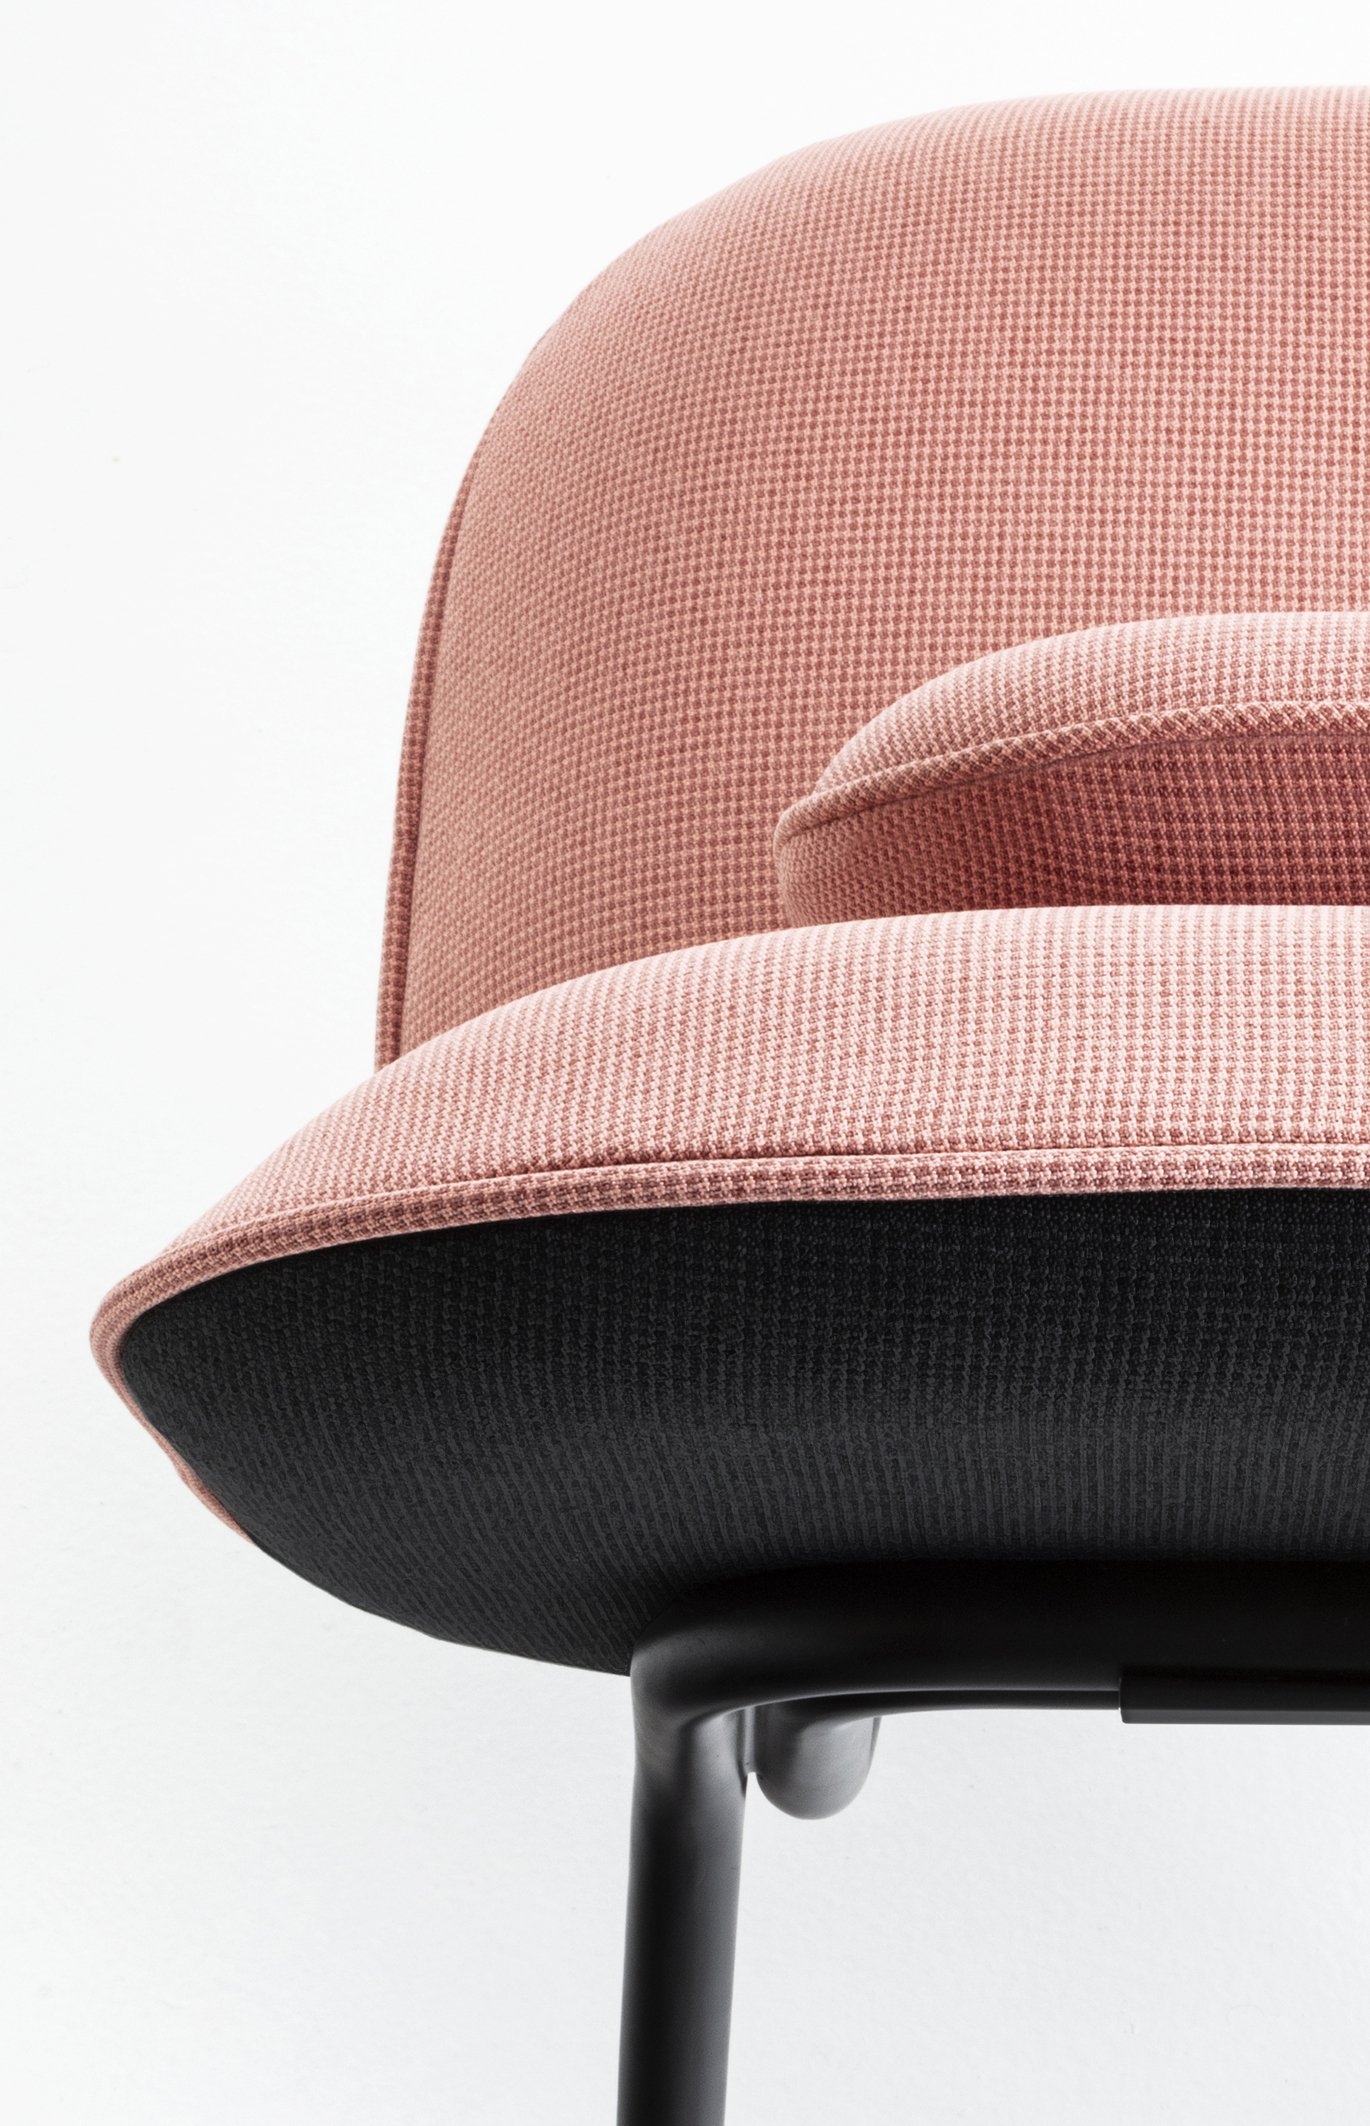 Tasca Lounge Chair | frontal detail foto, Gabriel pink salmon Fabric